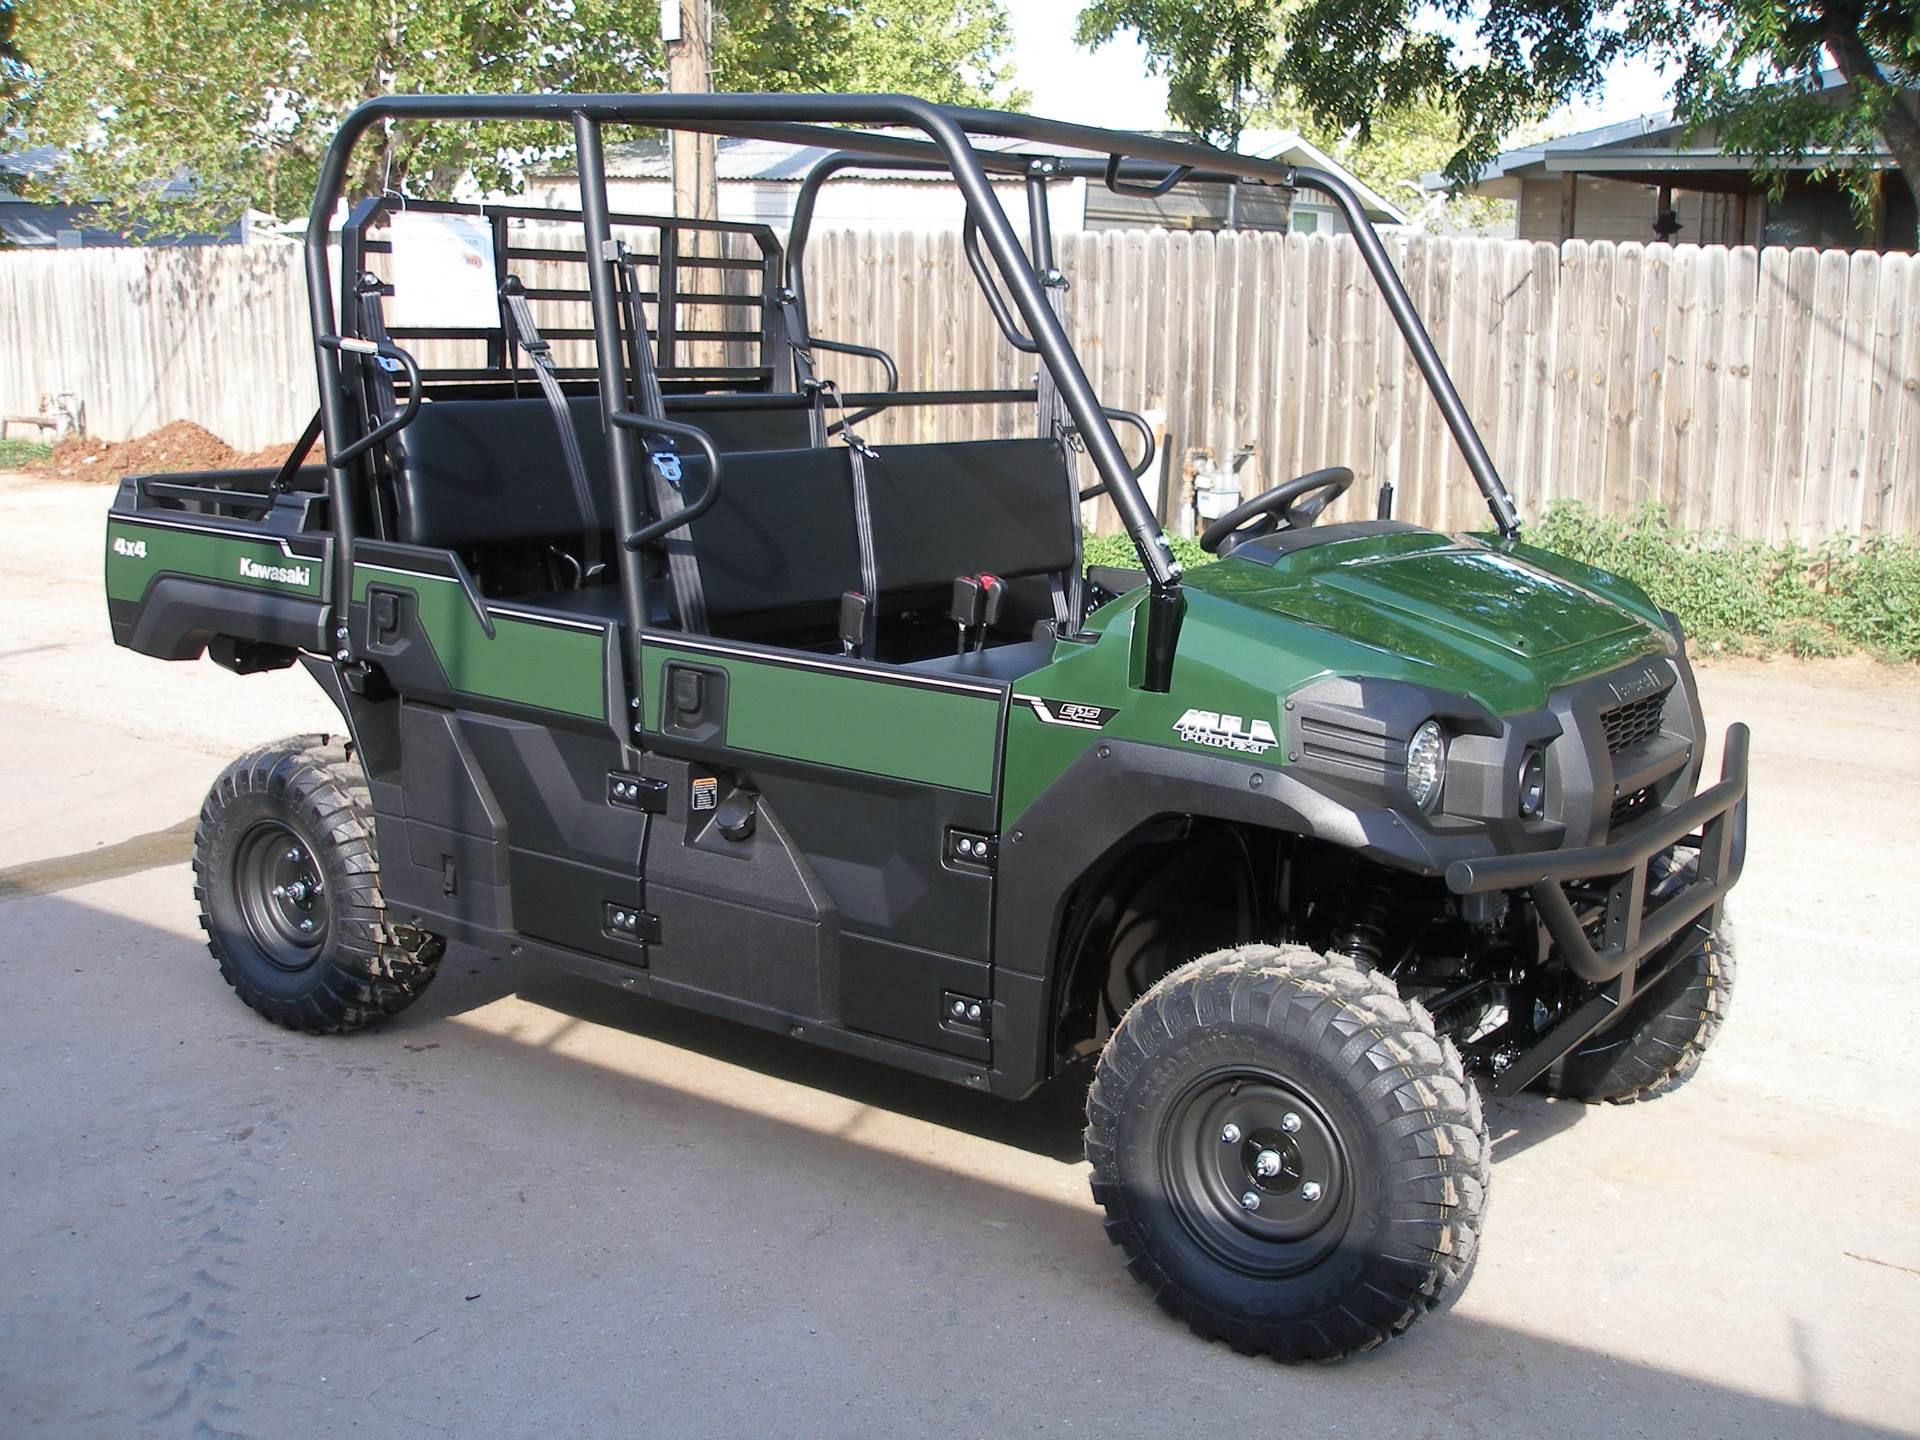 Kawasaki mule pro eps utility vehicles abilene texas jpg 1920x1440 Kawasaki  mule 1000 specs